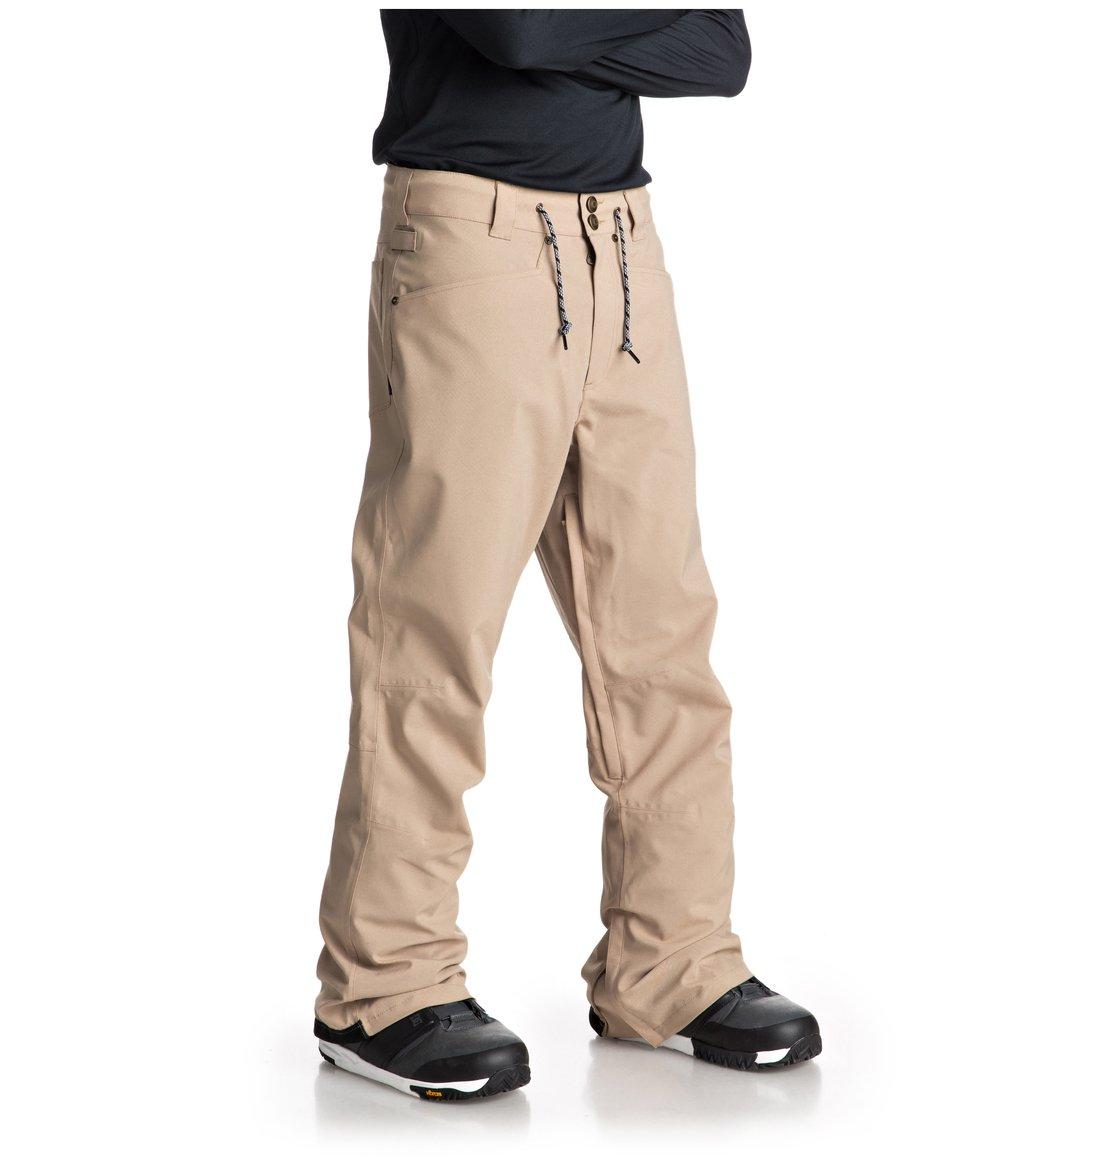 27cea7f7da9 DC-Shoes-Relay-Snow-Pants-EDYTP03034 vista en miniatura 11